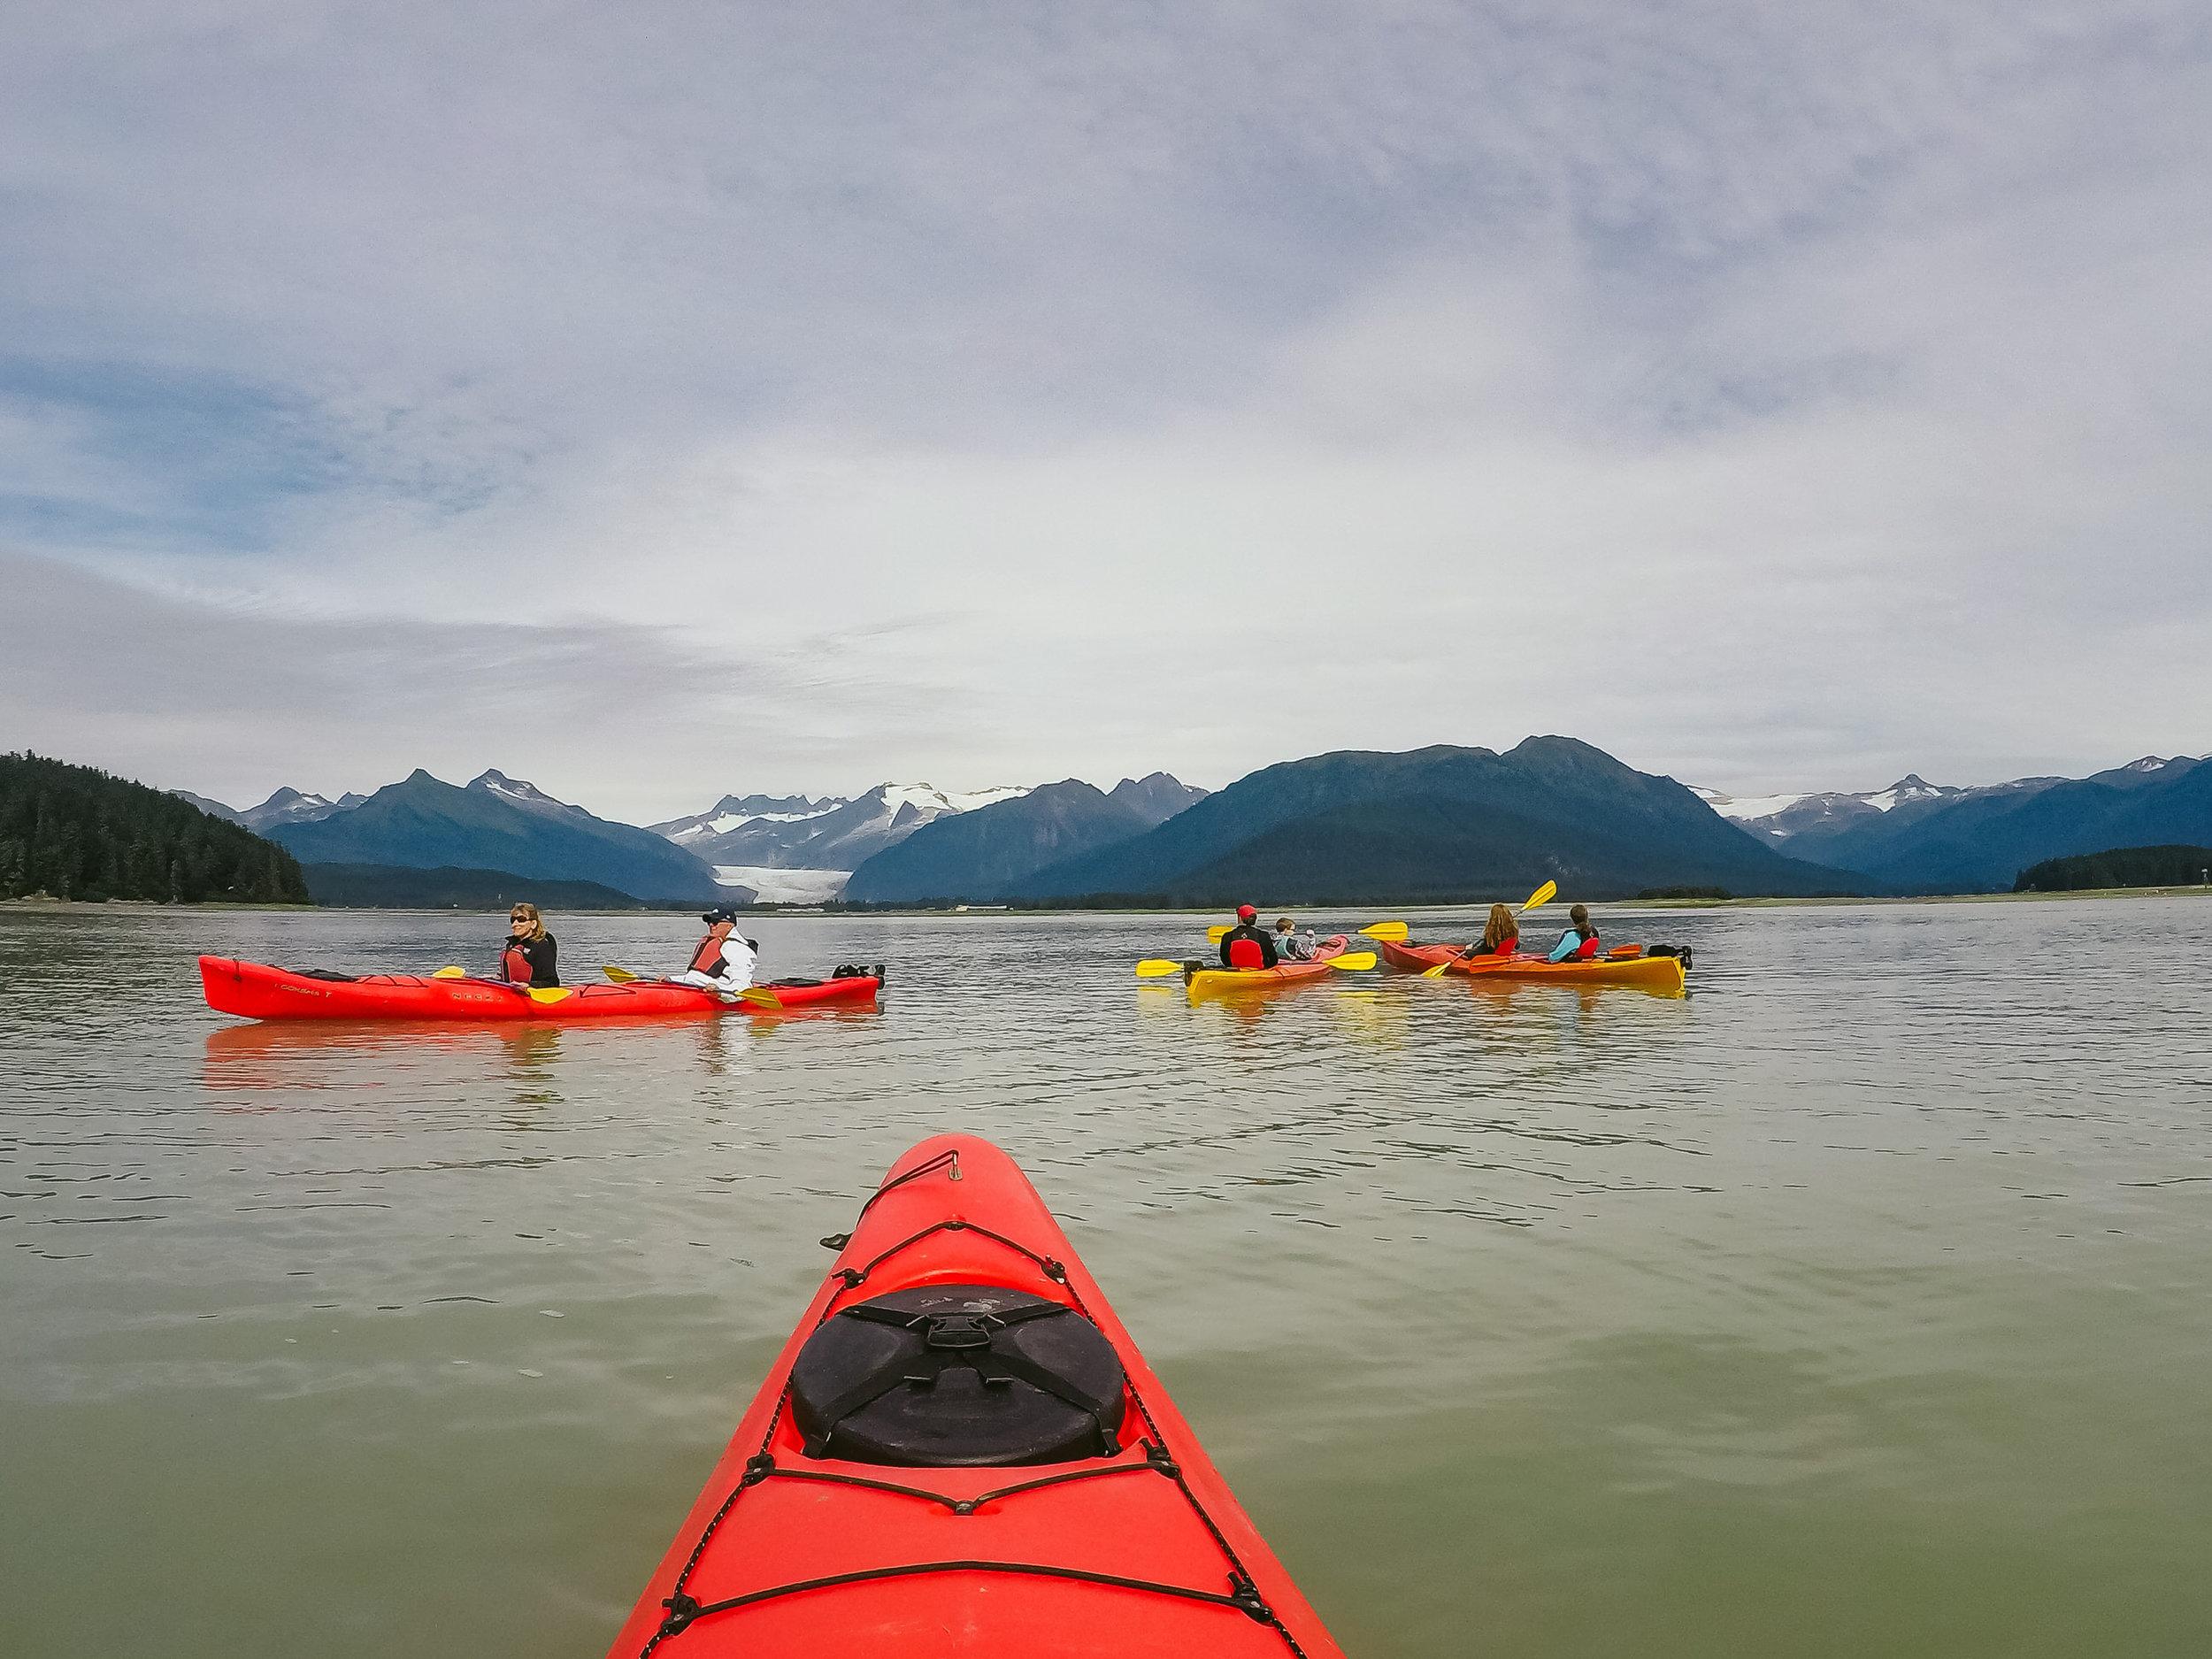 kayak_go_pro_juneau_alaska_adventure_tiny_house_photo-5.jpg